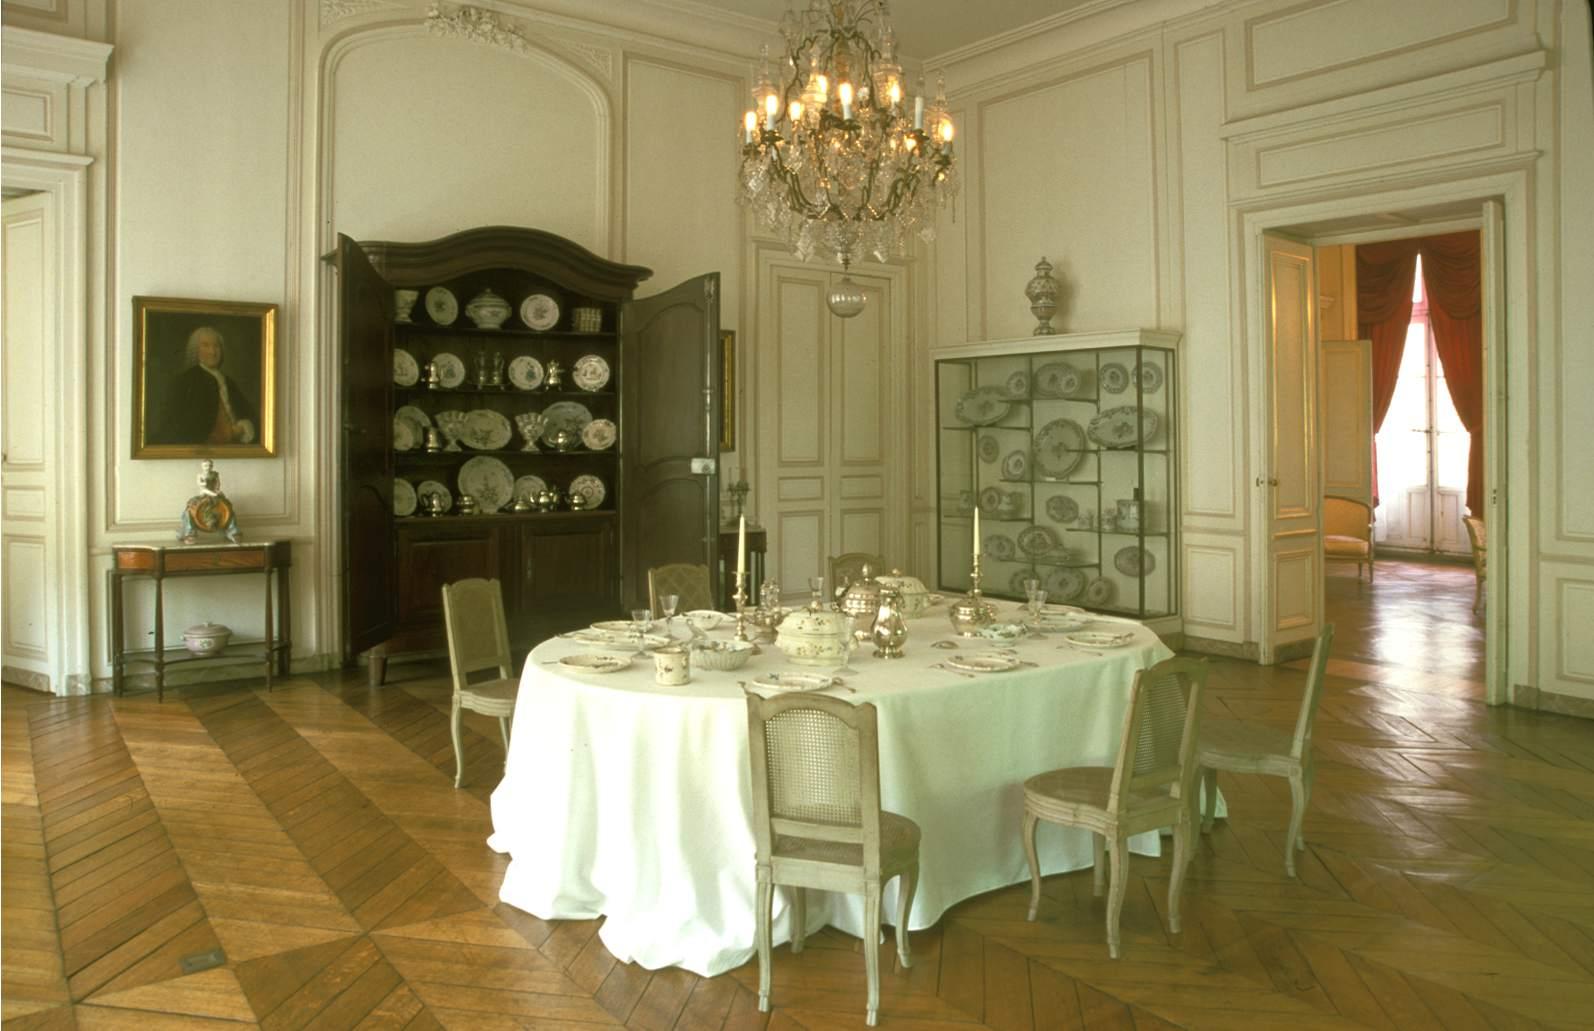 The Decorative Arts Museum